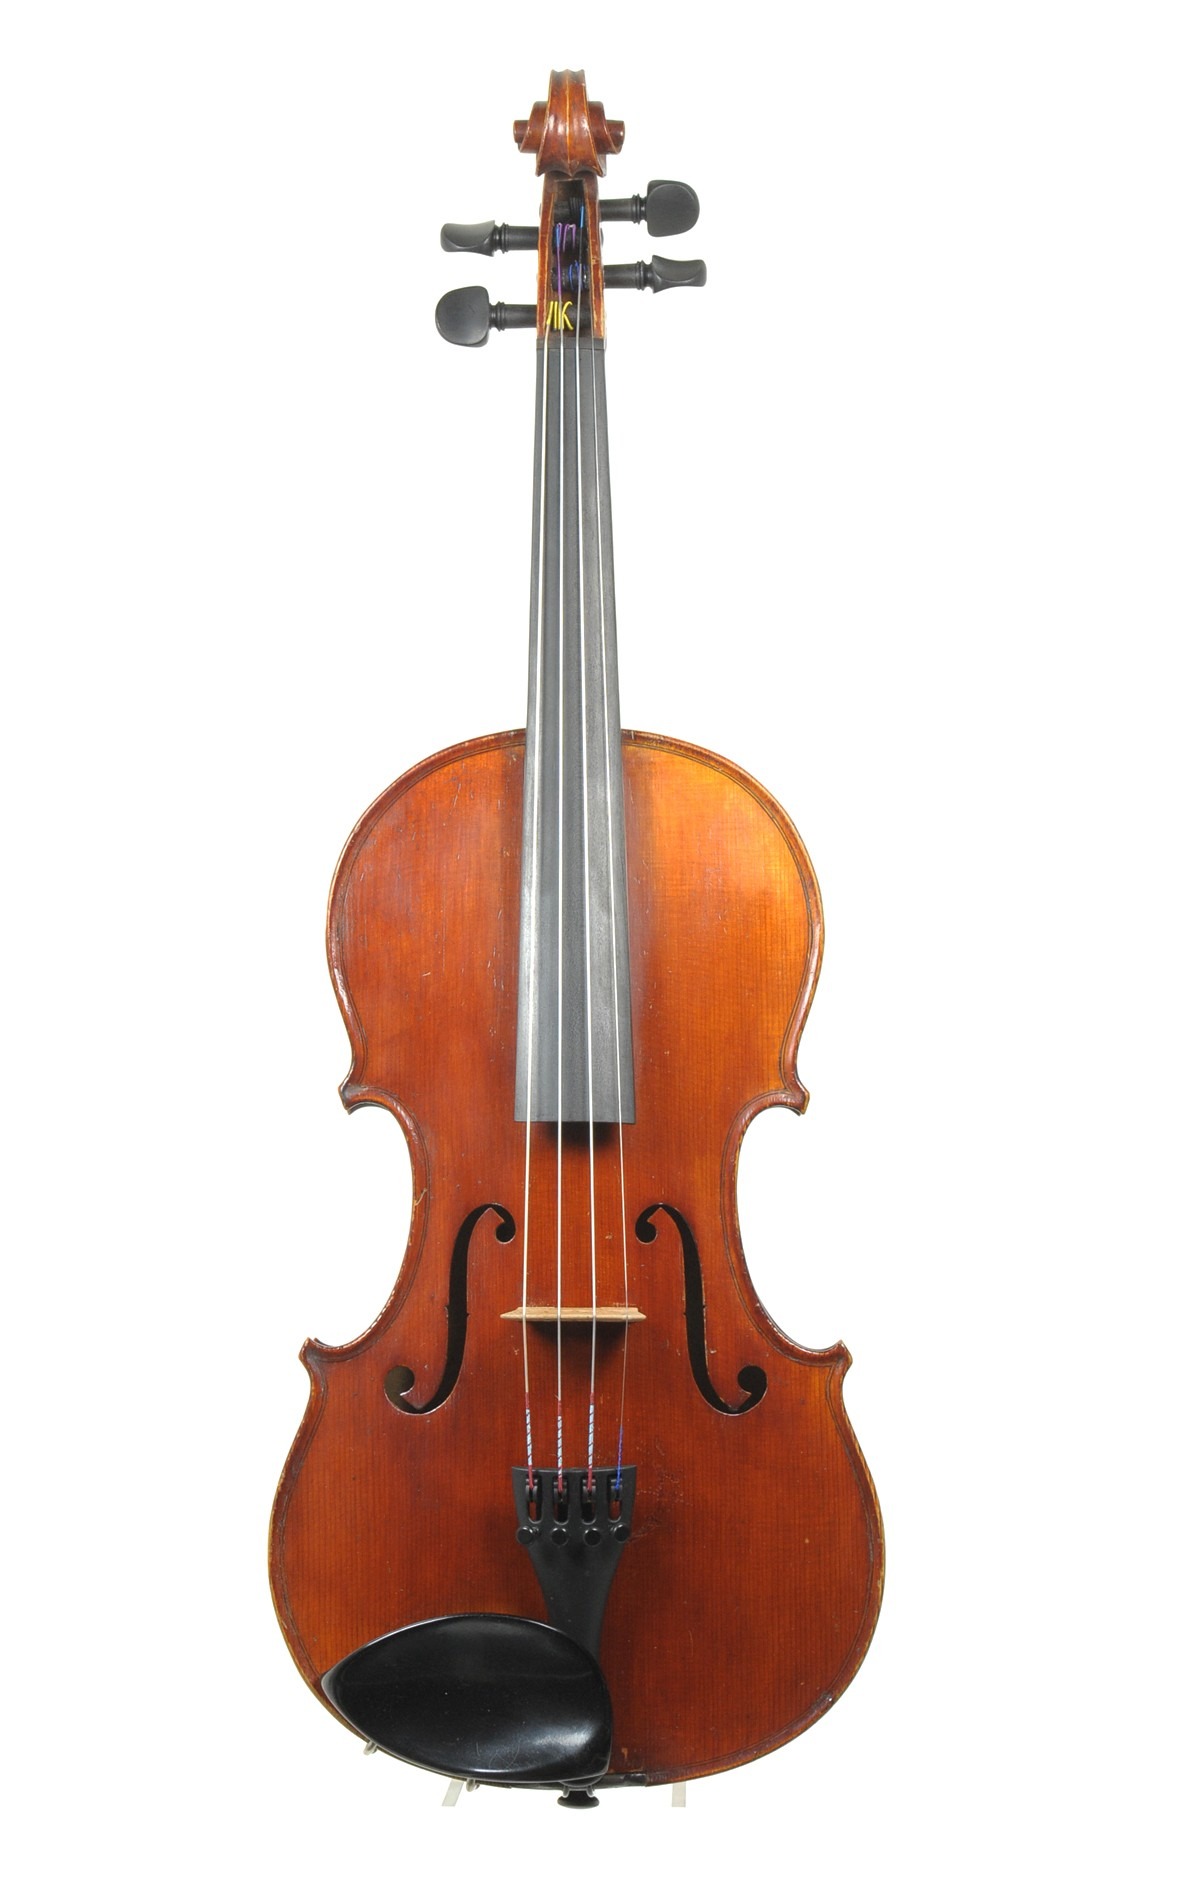 Philipp Keller, master violin, circa 1910 - top